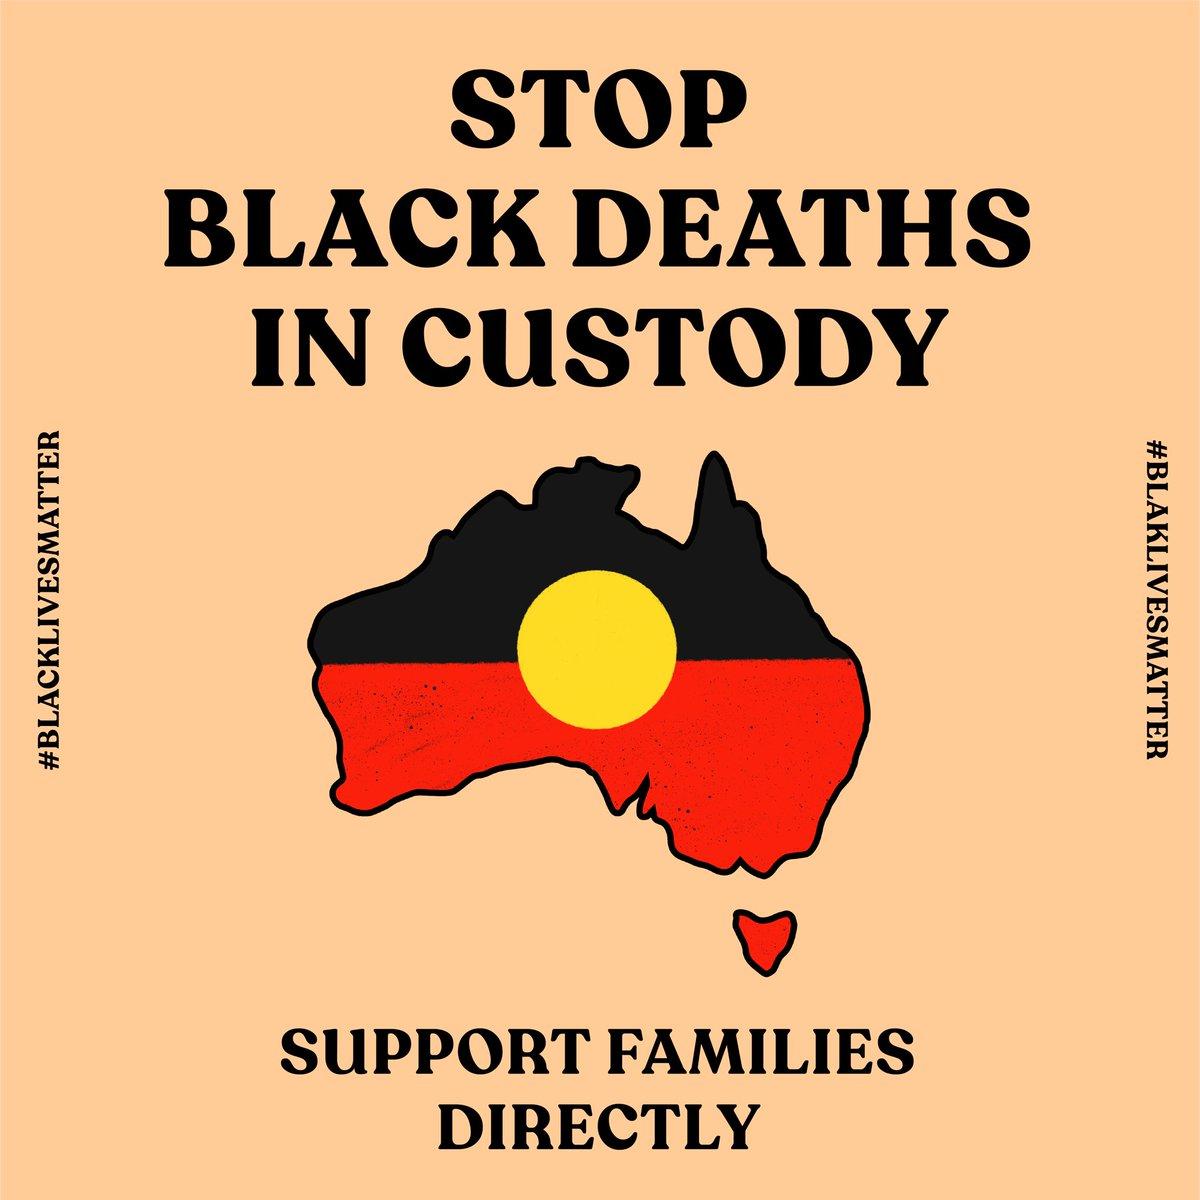 Stop Black Deaths in custody. Support families directly:  Justice for Joyce Clarke: https://t.co/SB81MiqtDu Justice for Walker: https://t.co/rJfiXLIRX4 Justice for Tanya Day: https://t.co/YRHD98ykOA Justice For David Dungay Junior: https://t.co/0jB2CYyMT1  #blaklivesmatter https://t.co/66nI7jn5Kd